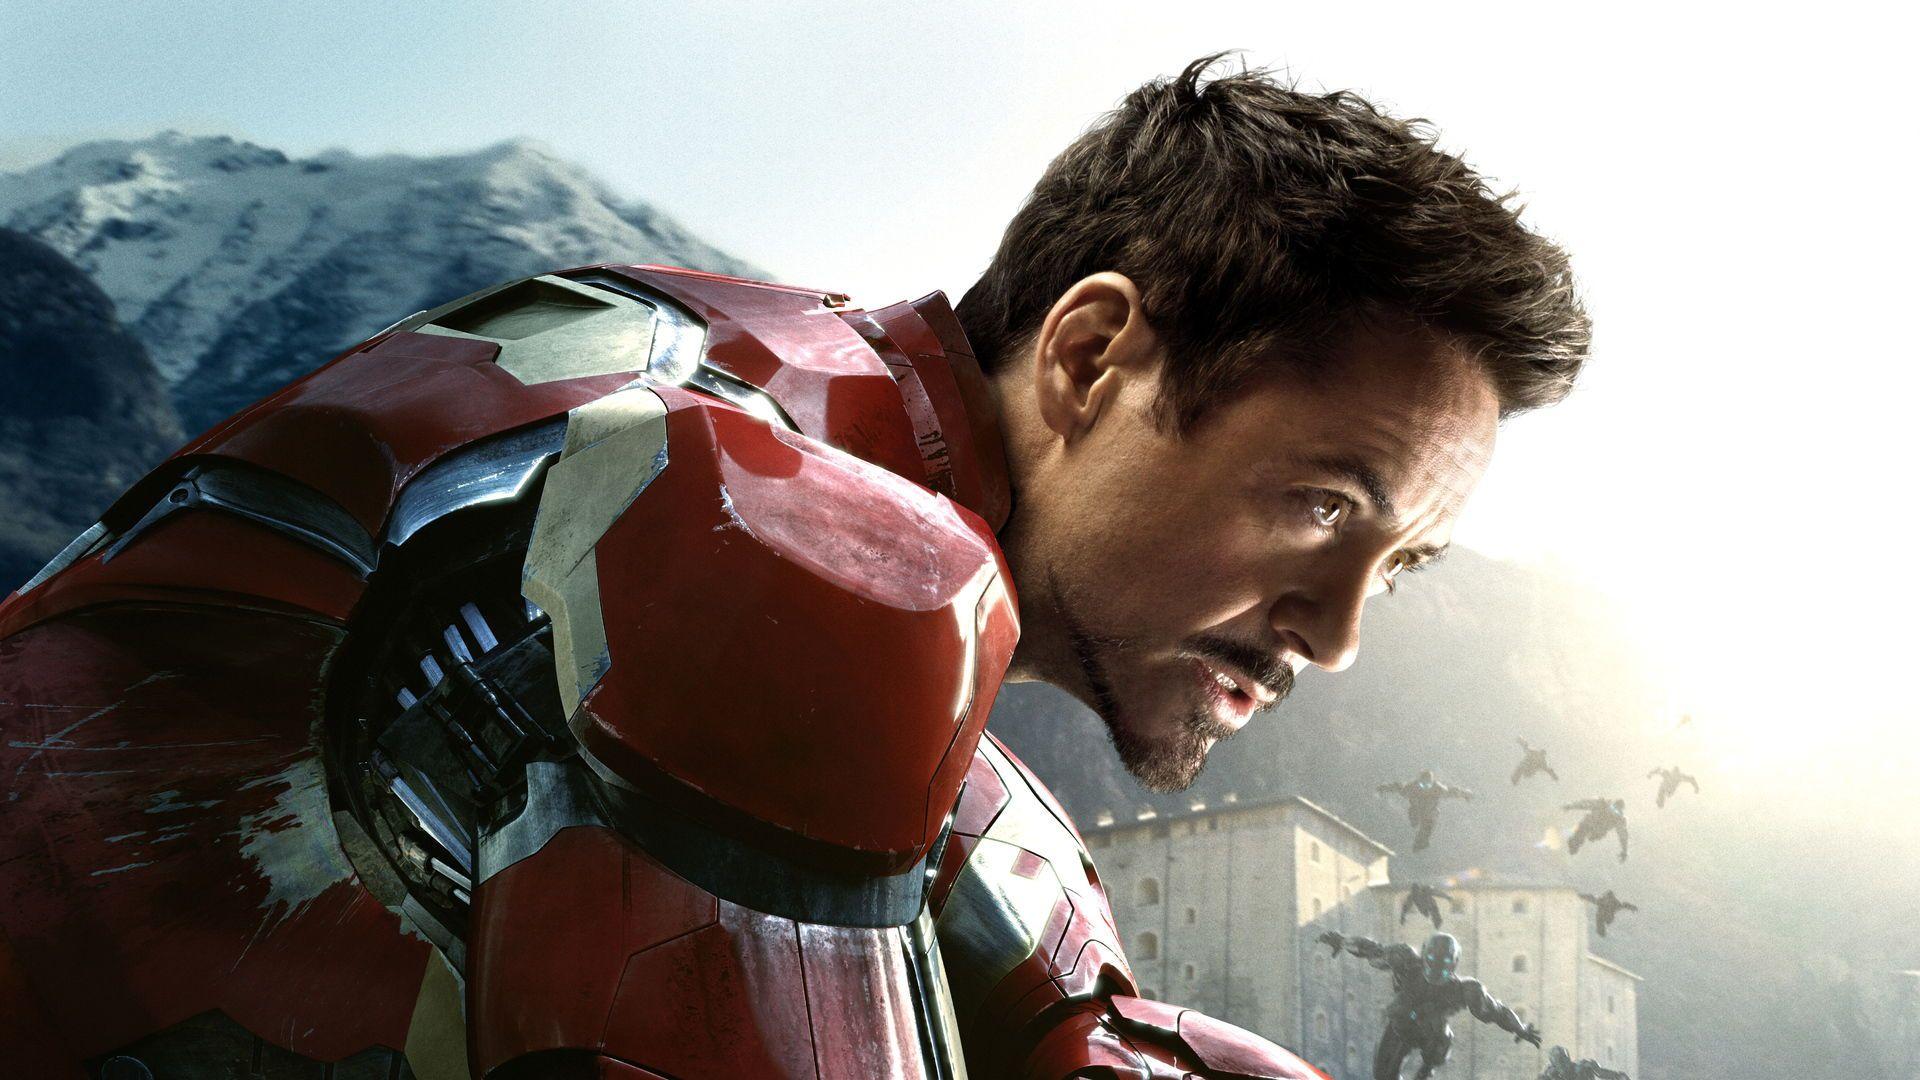 Robert Downey Jr. endorses OnePlus 7 Pro   Iron Man, Avengers: Endgame    #ironman #rdj #robertdowneyjr #marve…   Iron man hd wallpaper, Iron man  wallpaper, Iron man